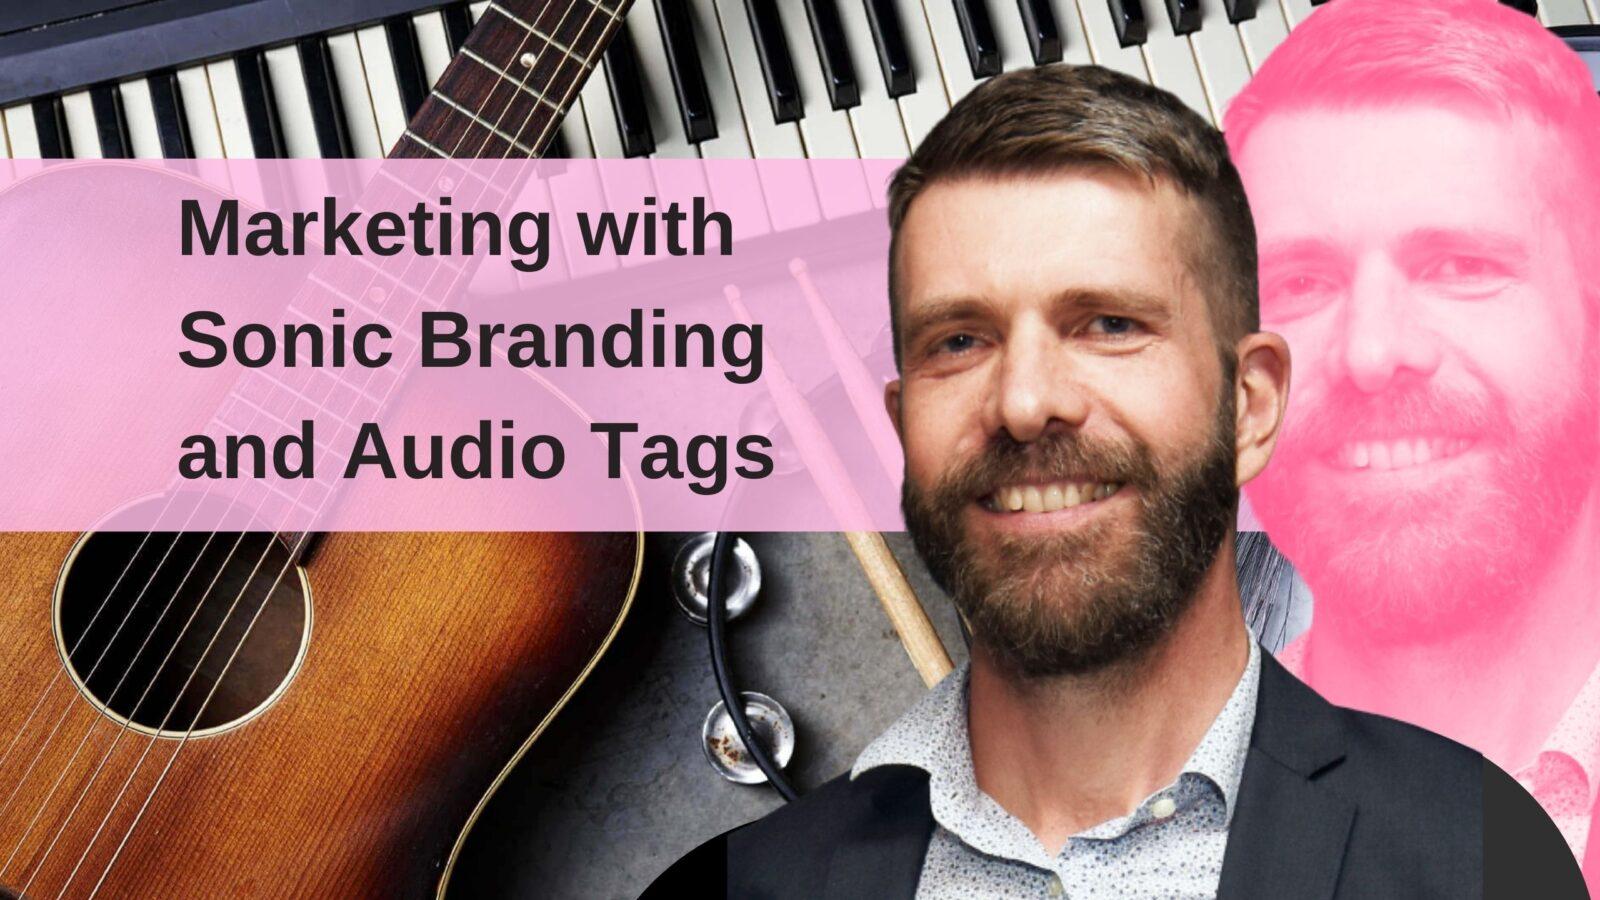 Sonic Branding music acustic logo identity Olivier Jamin Changeart OJC Musical marketing consulting lgbt entrpreneur lgbtq professional gay business owner OutBuro online community